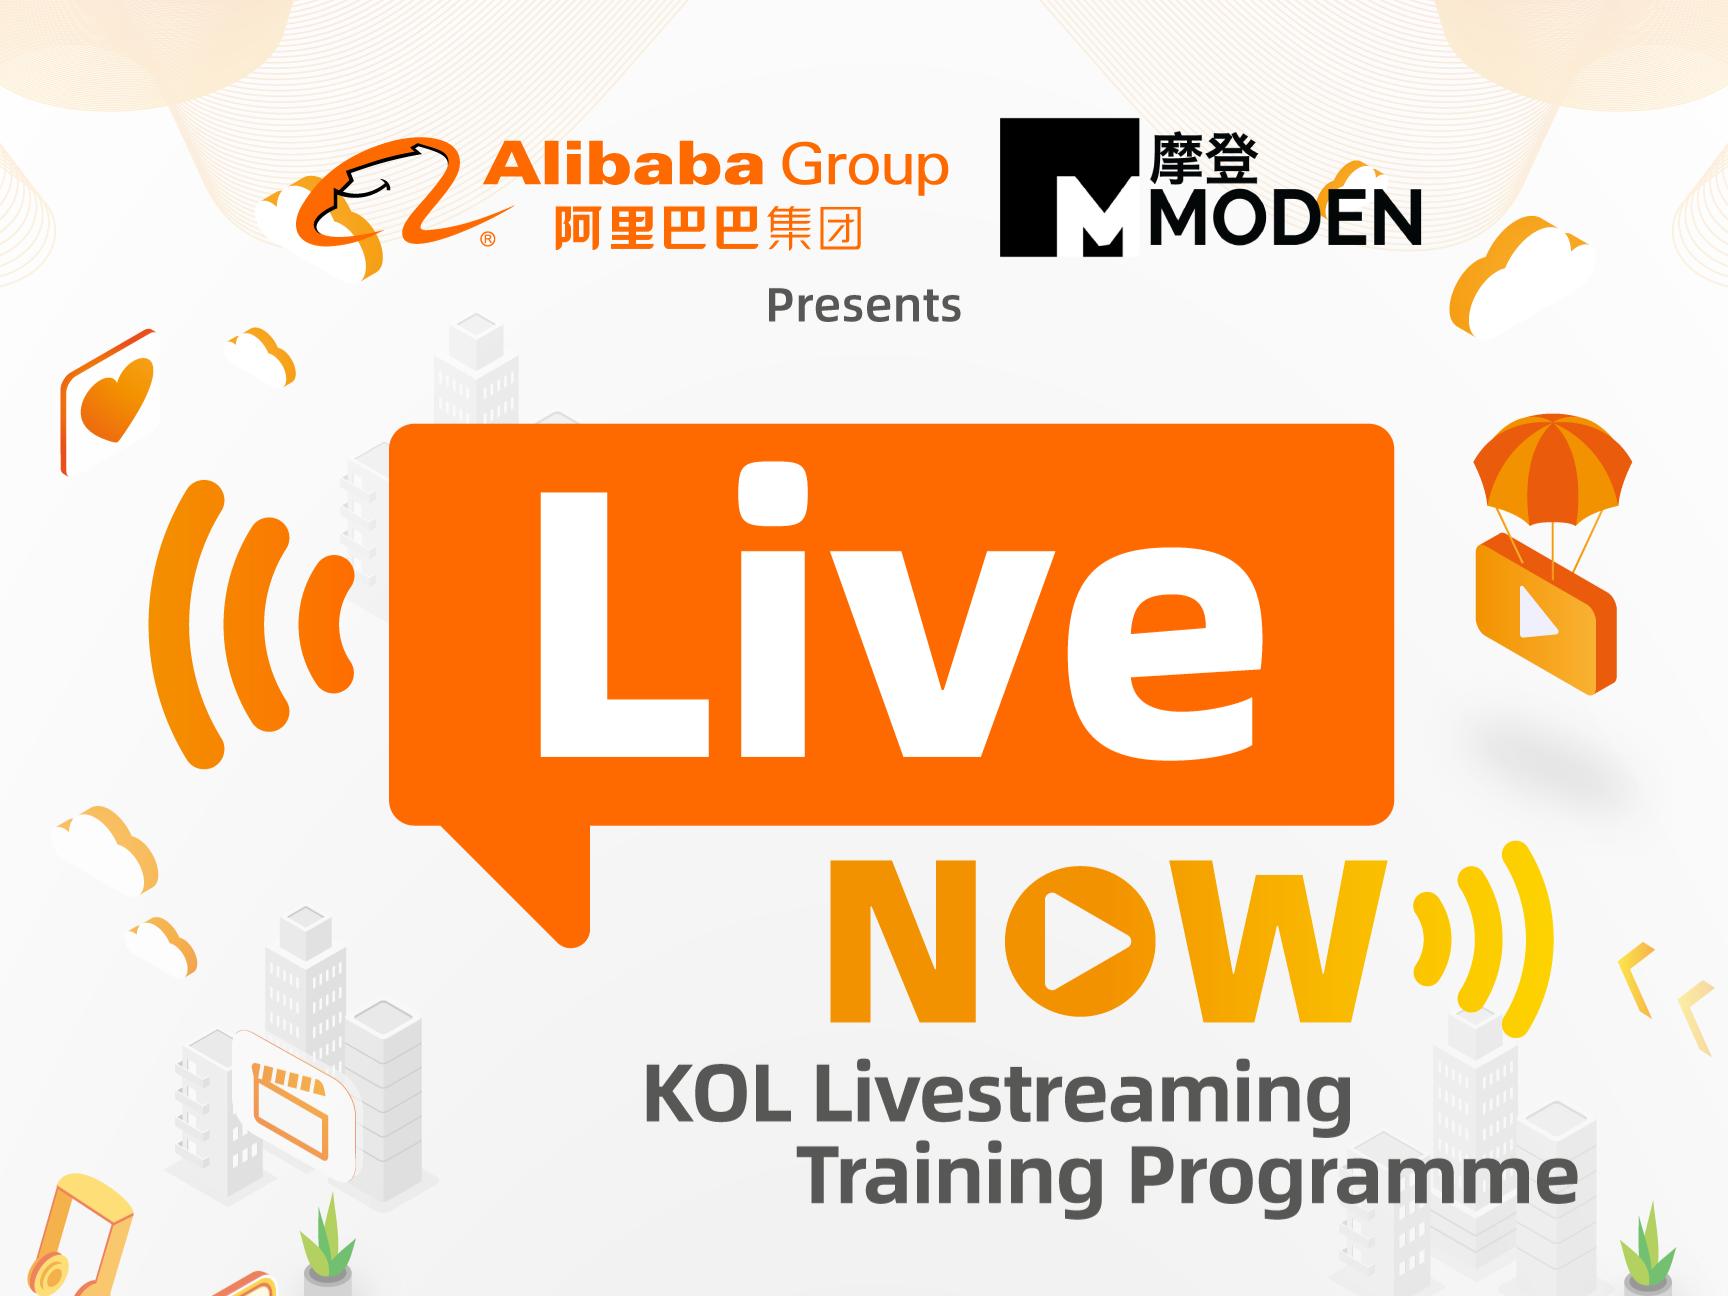 LiveNOW KOL Livestreaming Training Programme